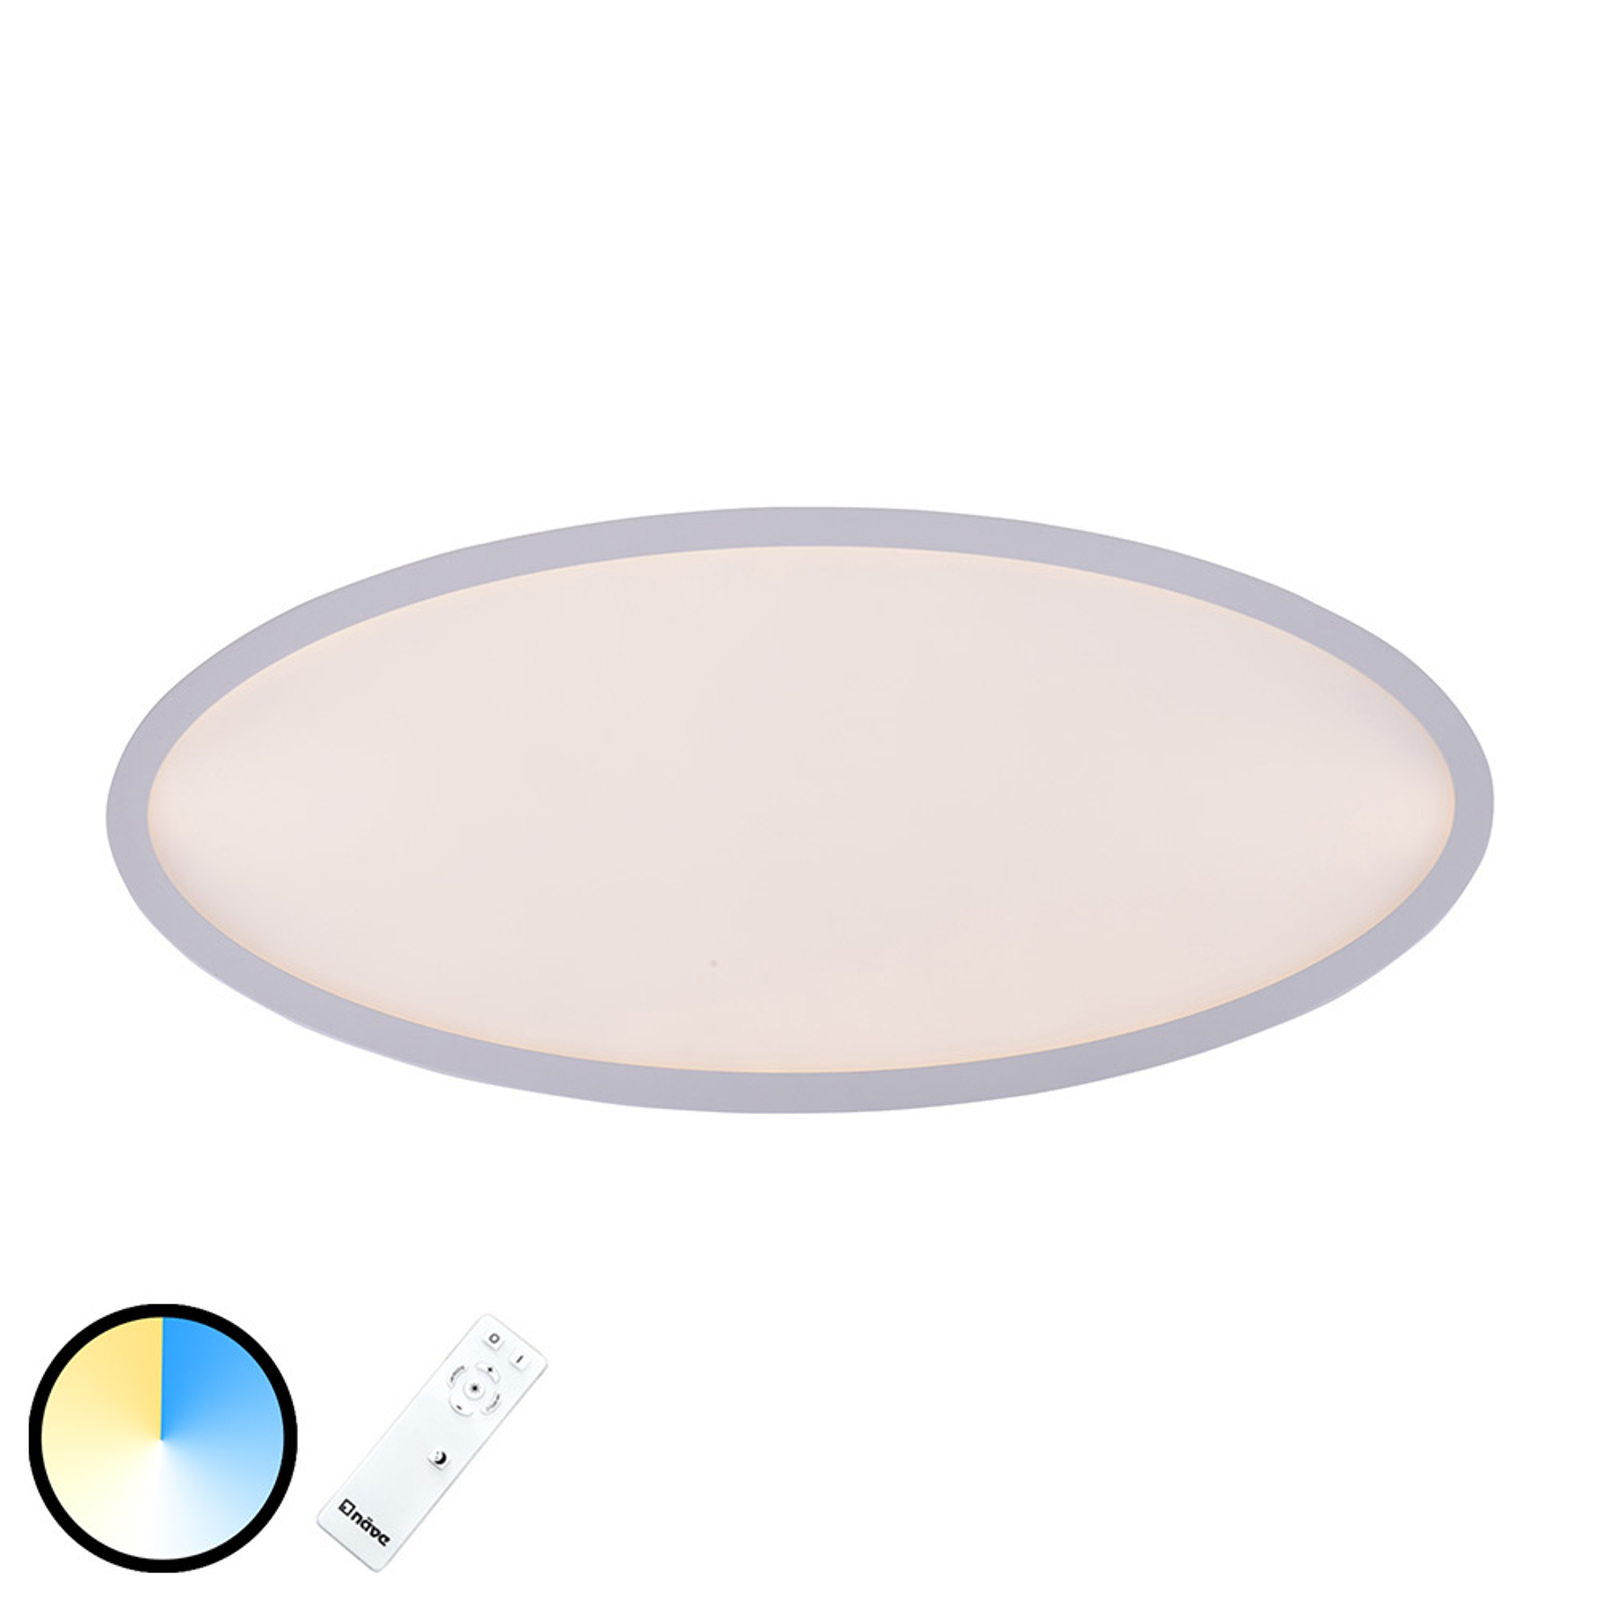 LED plafondlamp Pesaro ovaal 80 cm x 35 cm